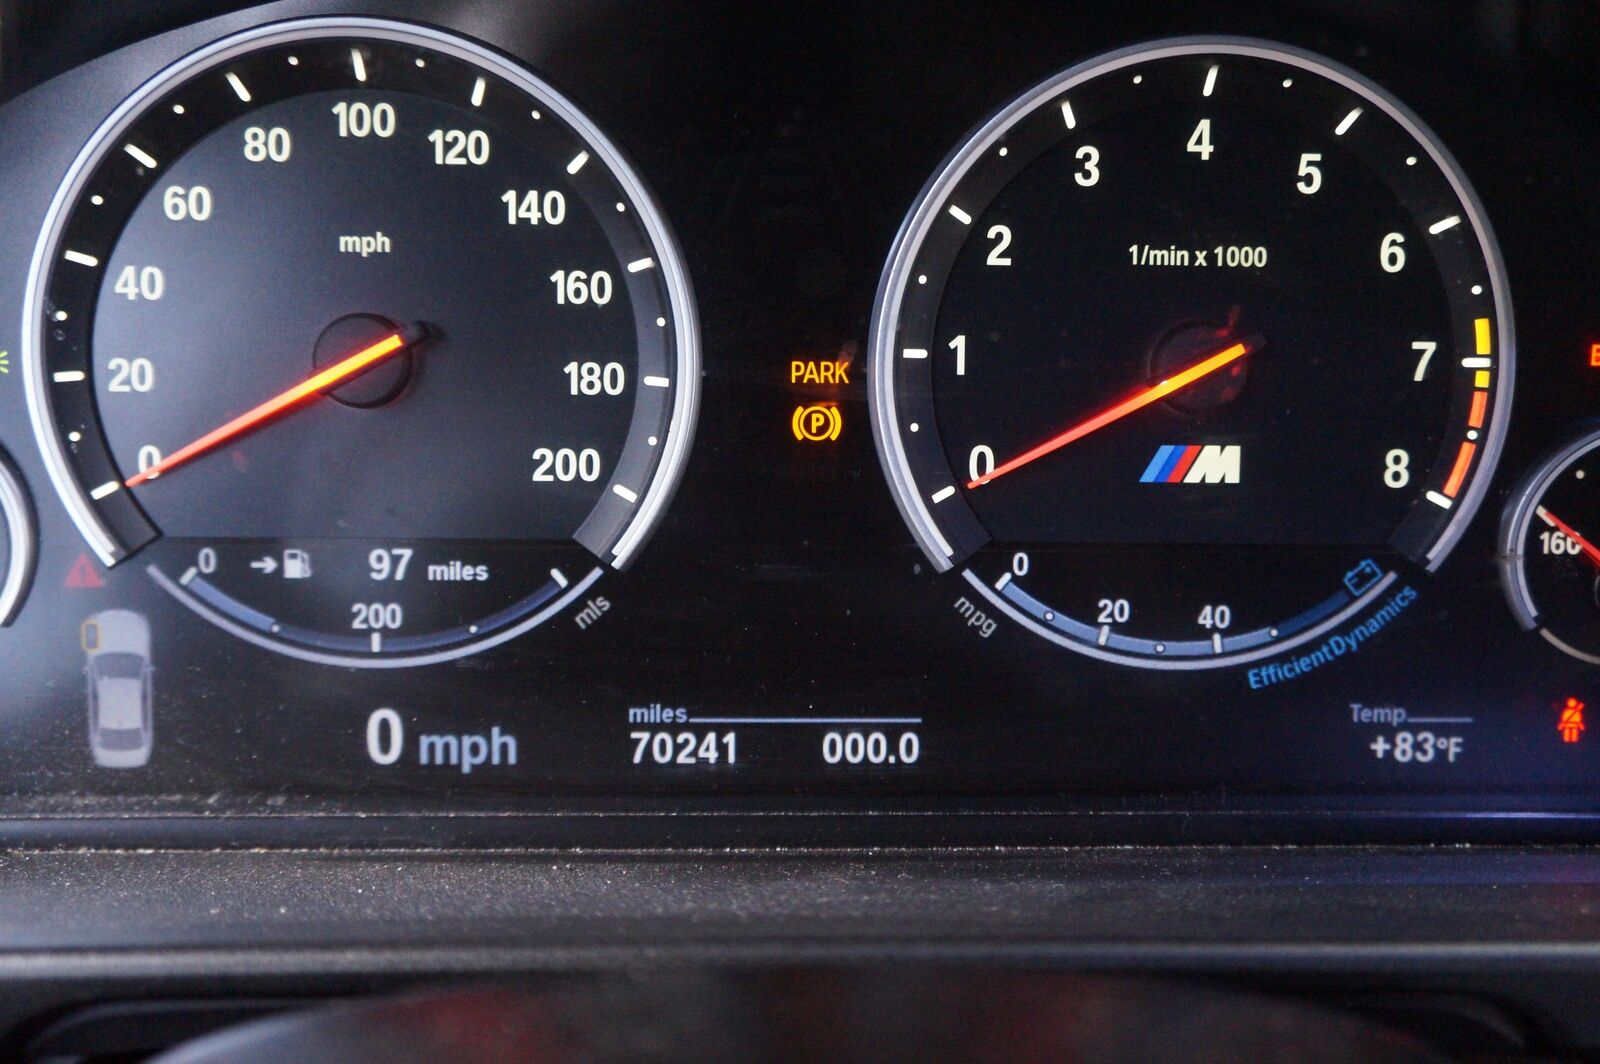 2013 Bmw M5 Fuse Box Wiring Data Schematic Mercedes Benz E 420 Diagram Comprehensive Diagrams U2022 Rh Problego Co 2011 2016